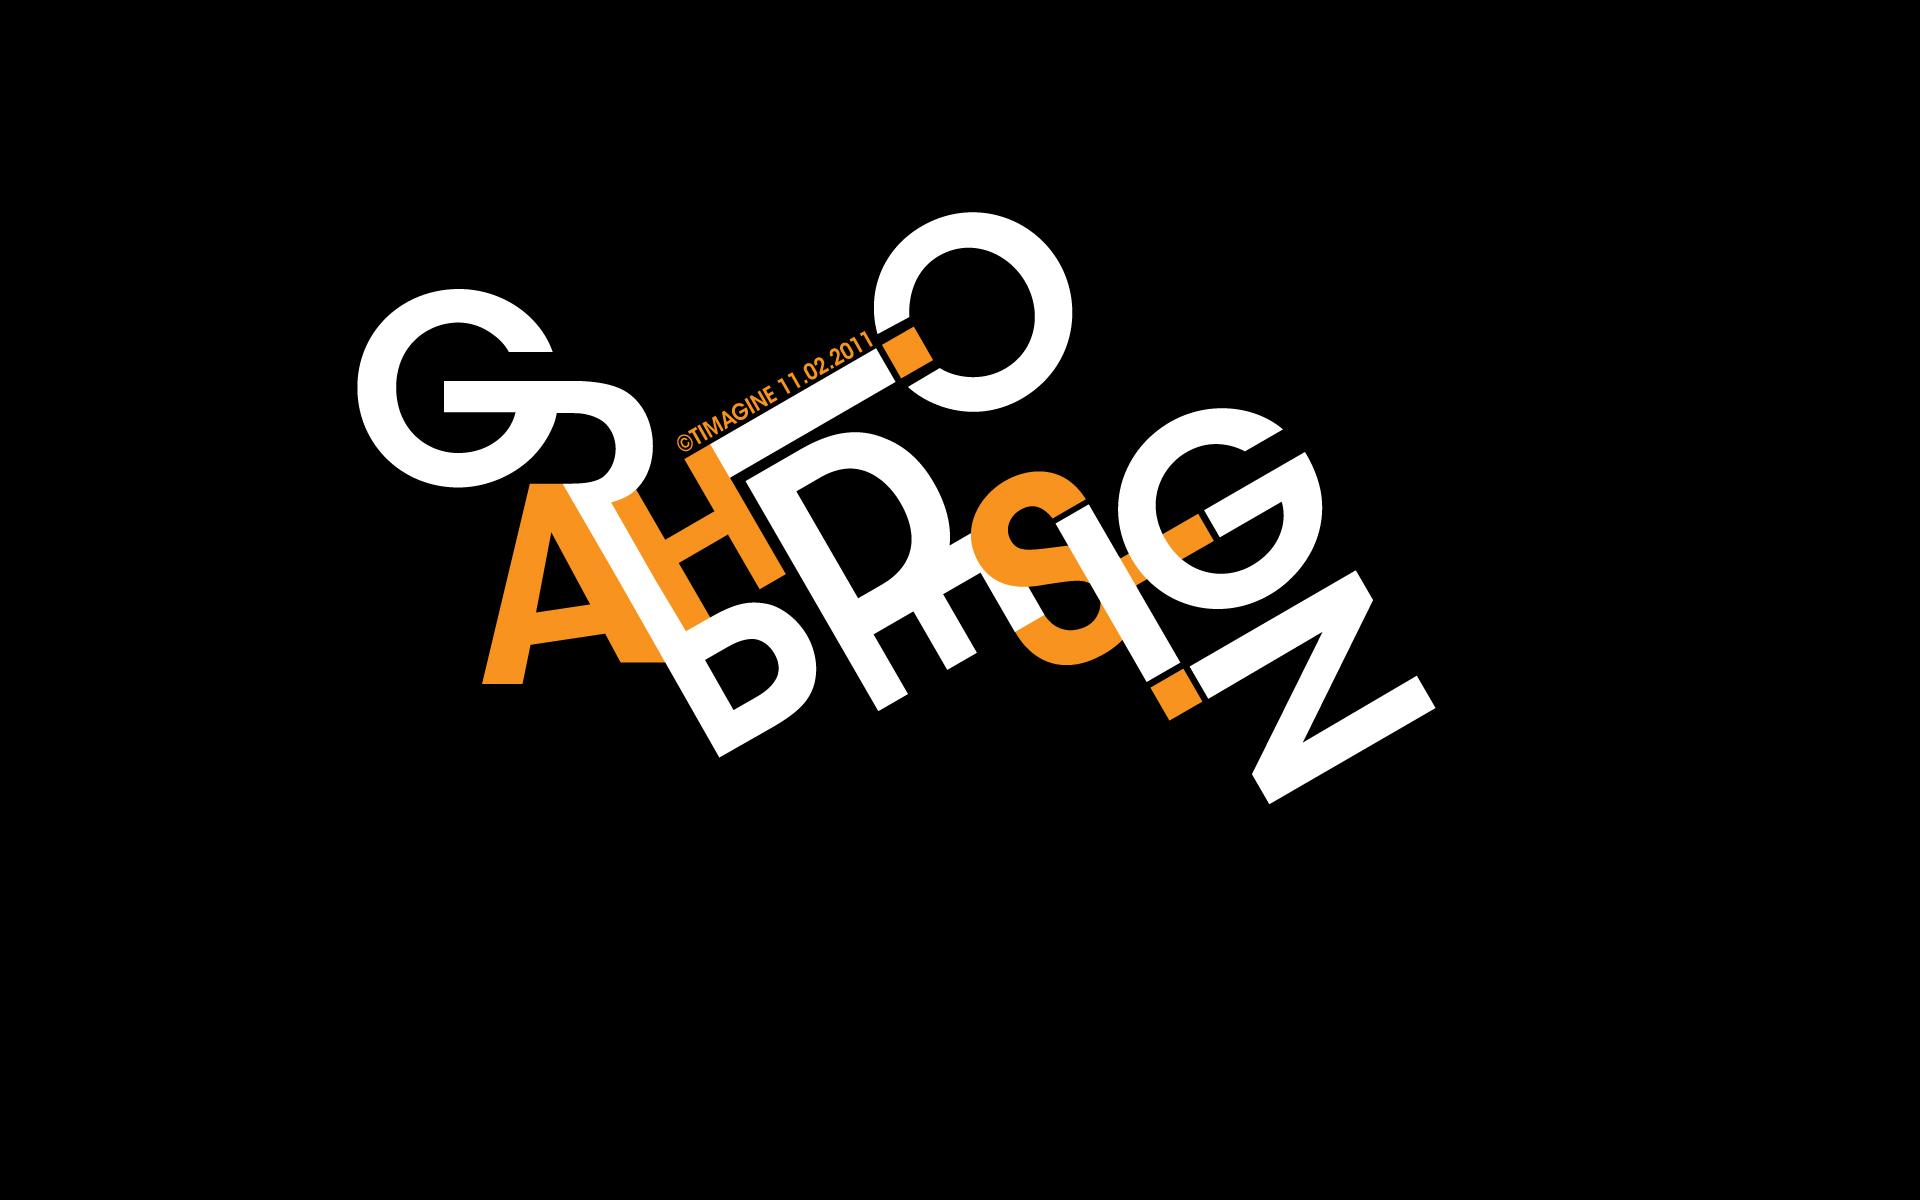 10 Graphic Design Online Schools Graphic Design 2936678 Hd Wallpaper Backgrounds Download